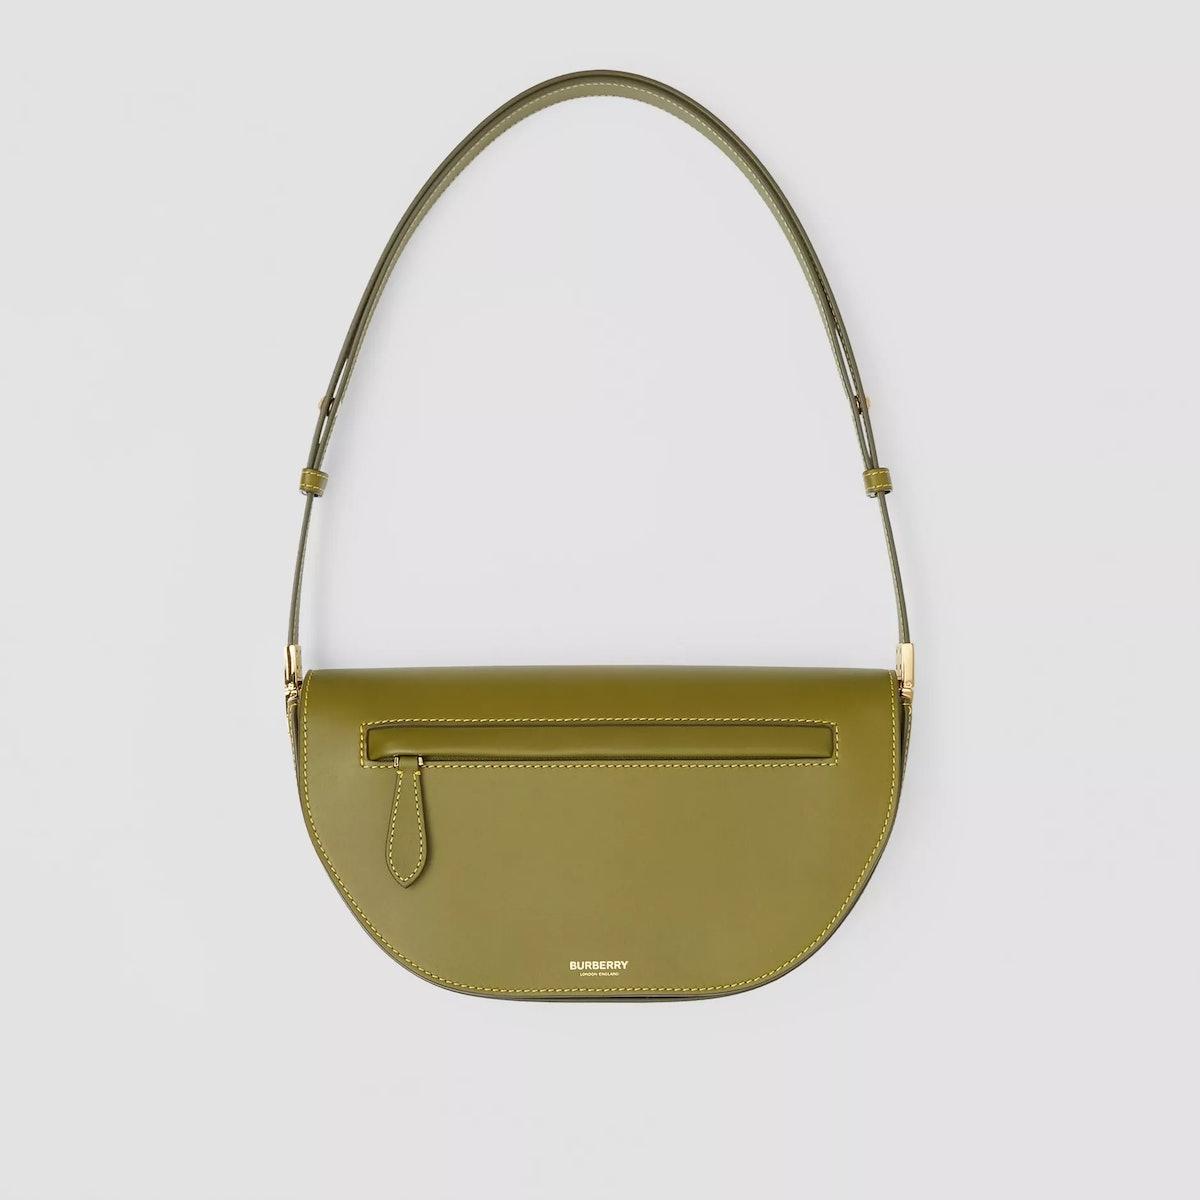 Small Burberry Olympia shoulder bag in Juniper Green.